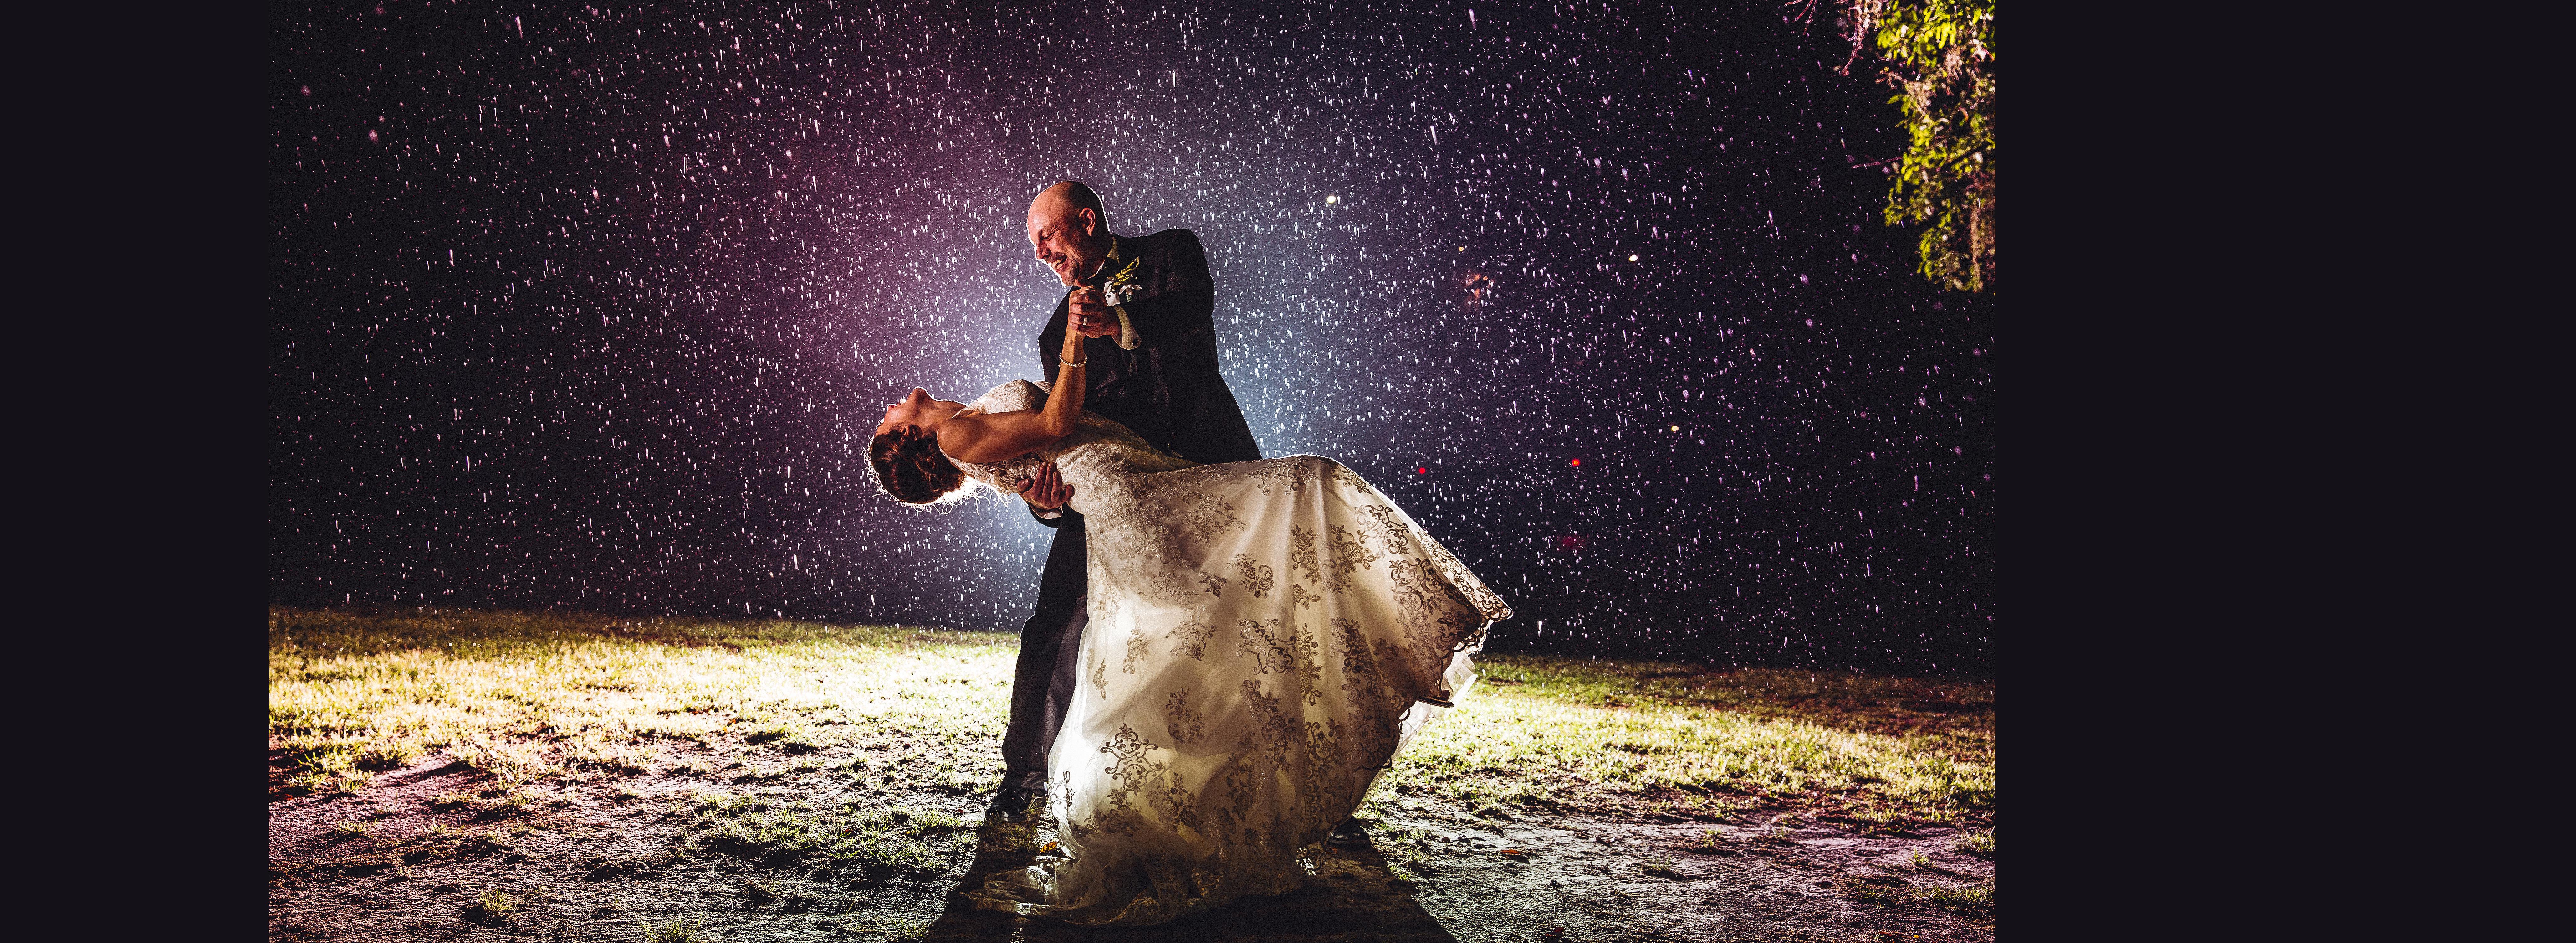 Spring Rain Wedding